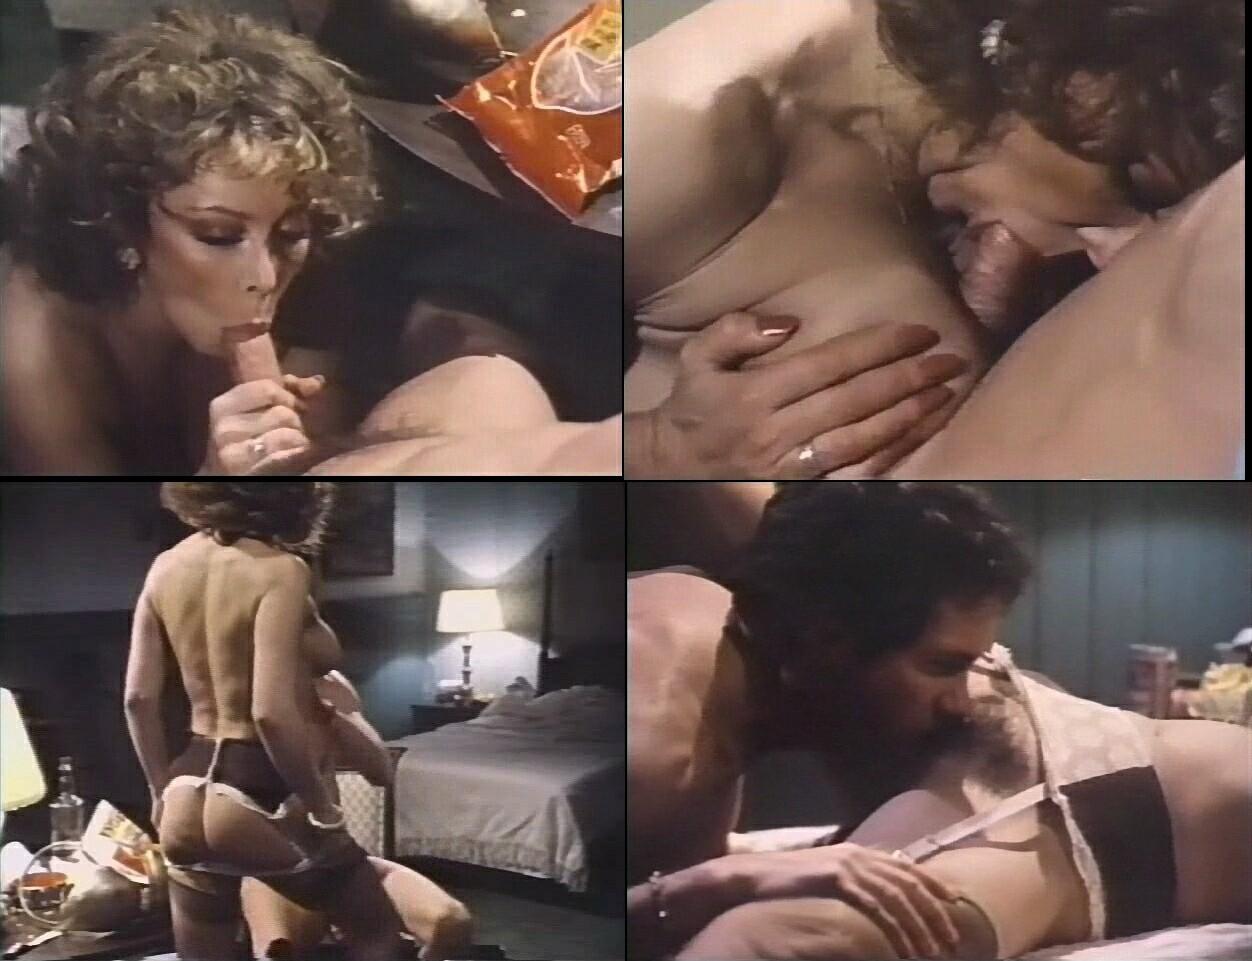 Angelique Pettyjohn Porn Movies angelique pettyjohn nude celebrities | joss picture cam